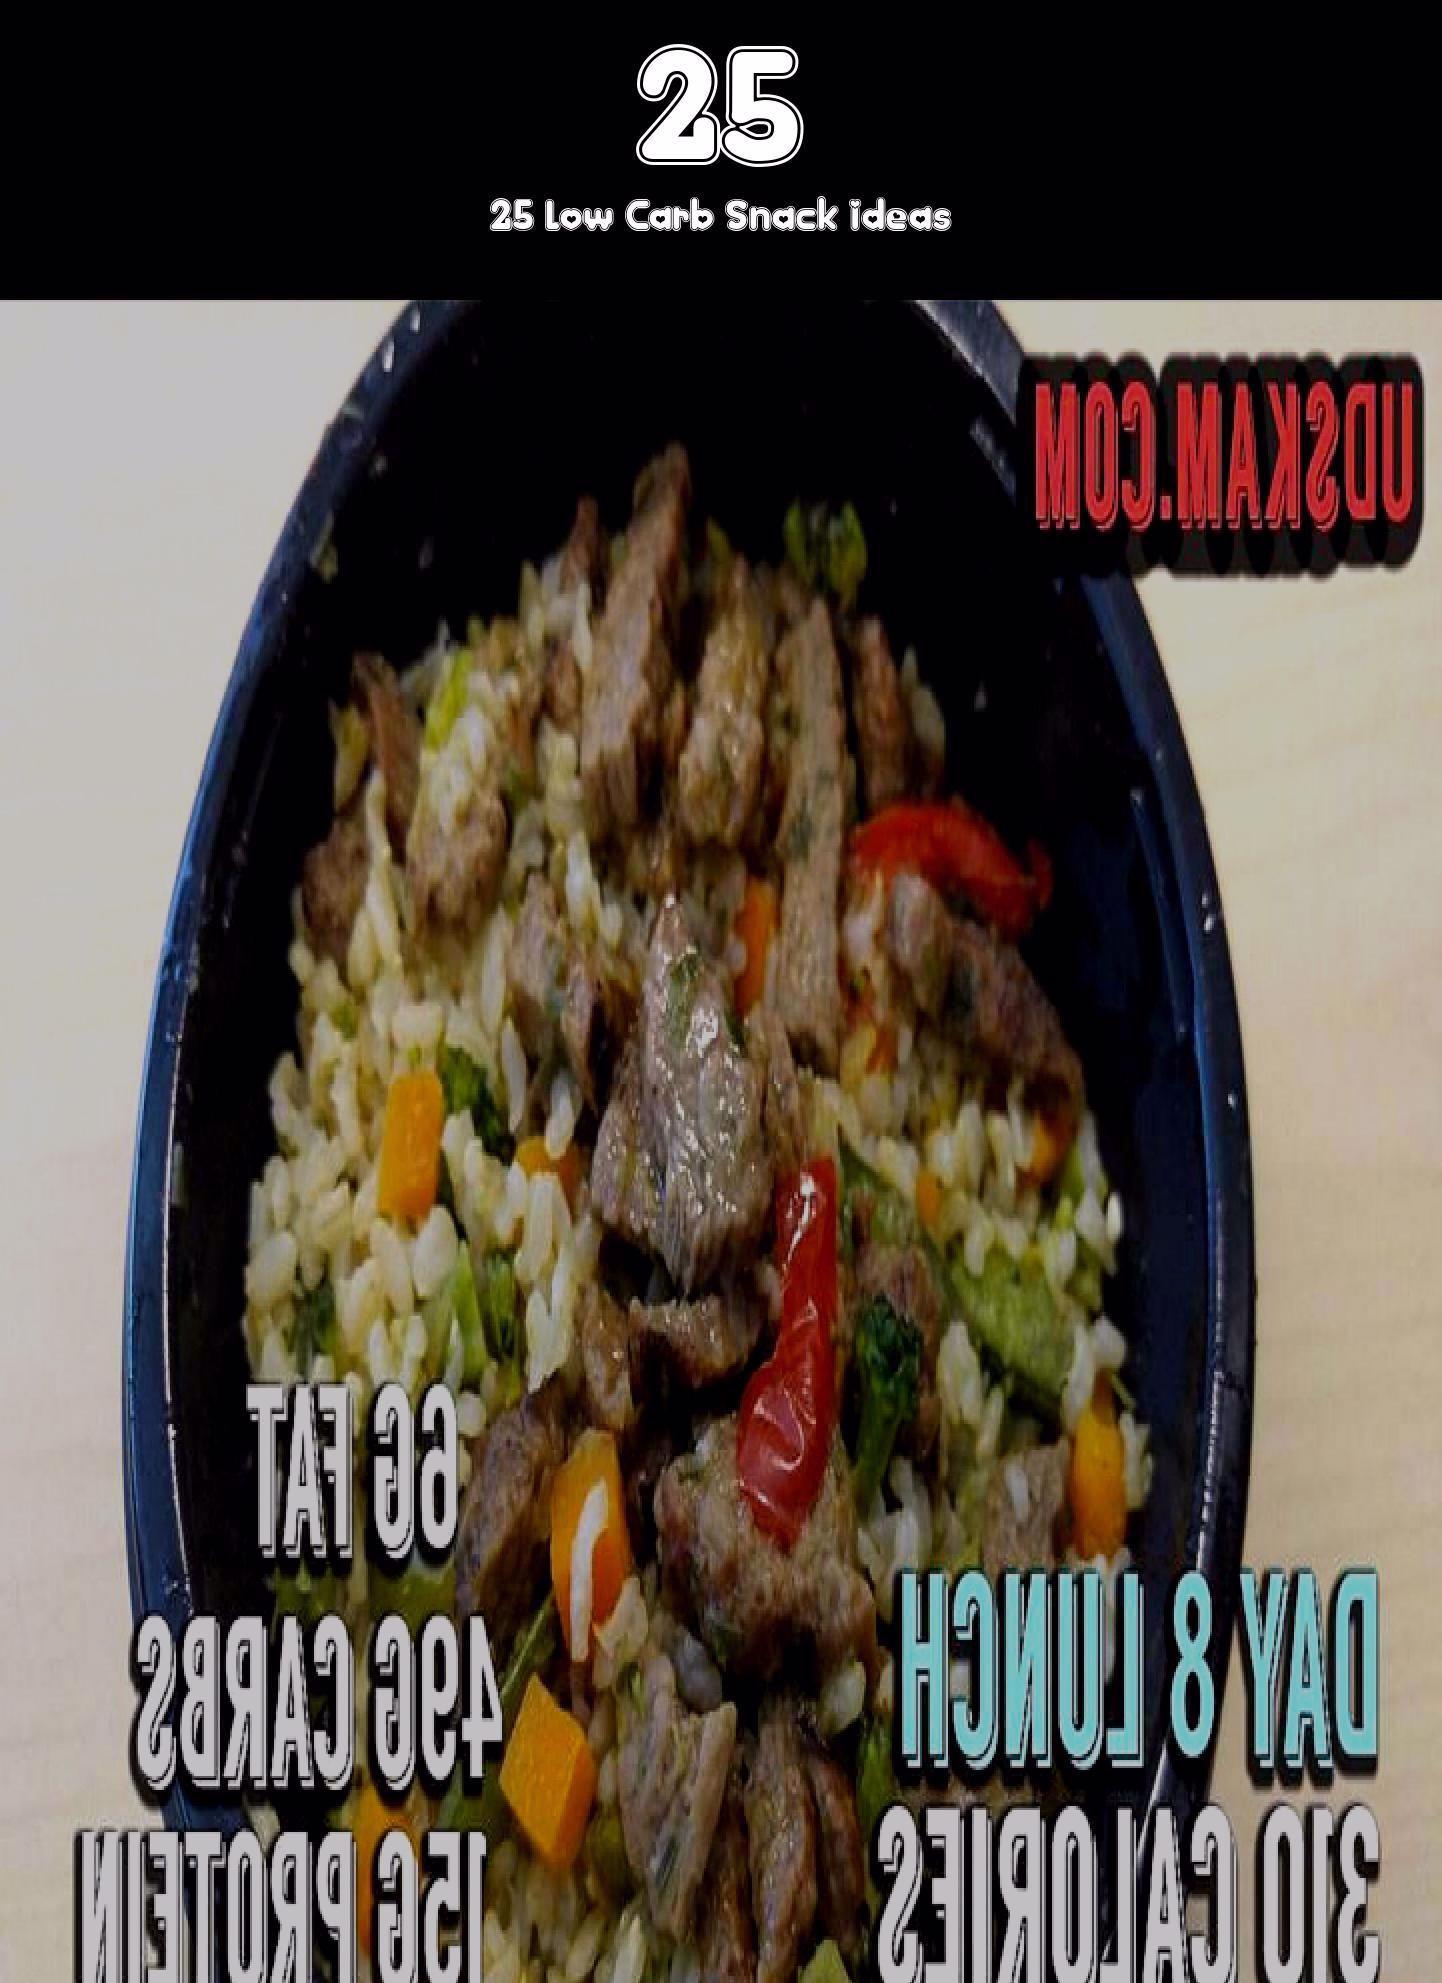 Day 8 lunch.. Evol Bulgogi Beef Bowl.  #kinobody #intermittentfasting #wsp #iifym #food #foodporn #yum #instafood #bulgogi #amazing #instagood #photooftheday #beef #diet #lunch #fresh #tasty #delish #delicious #eating #foodpic #foodie #foodpics #eat #hungry #foodgasm #bowl #fitness #cleaneating #eatclean by udskam 🧊  #lifestyle #sun